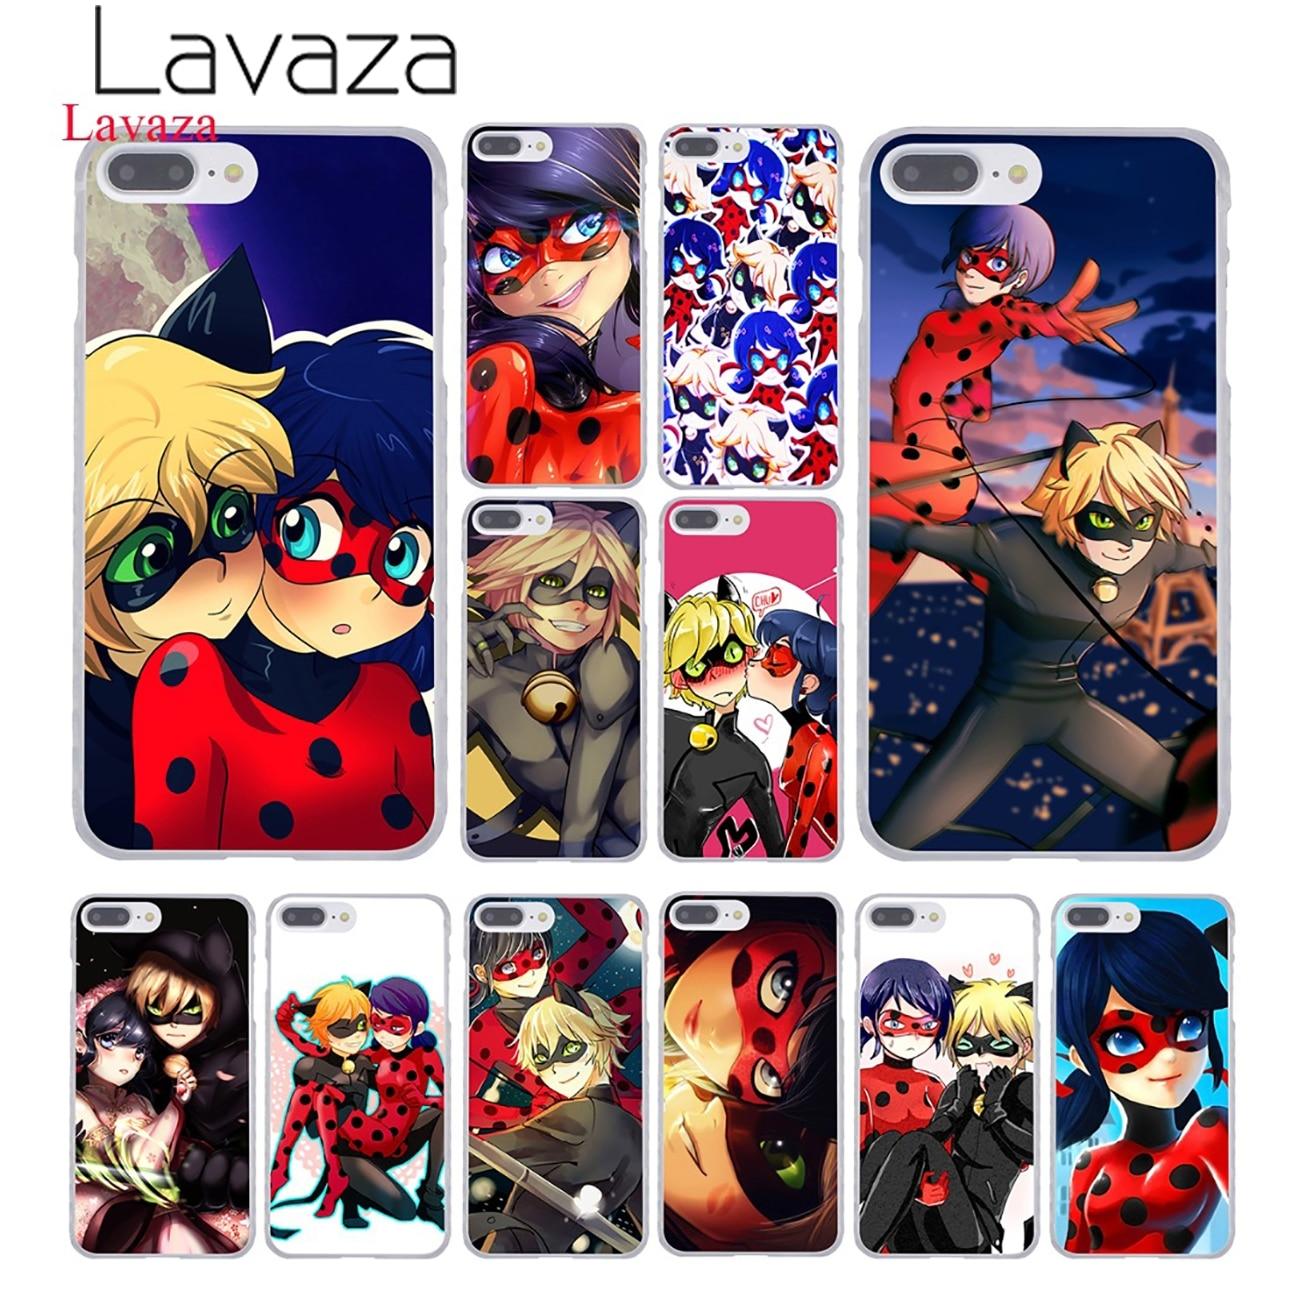 Lavaza Miraculous Ladybug and Chat Noir Hard Phone <font><b>Case</b></font> for Apple <font><b>iPhone</b></font> 8 7 6 6S Plus X <font><b>10</b></font> 5 5S SE 5C 4 4S